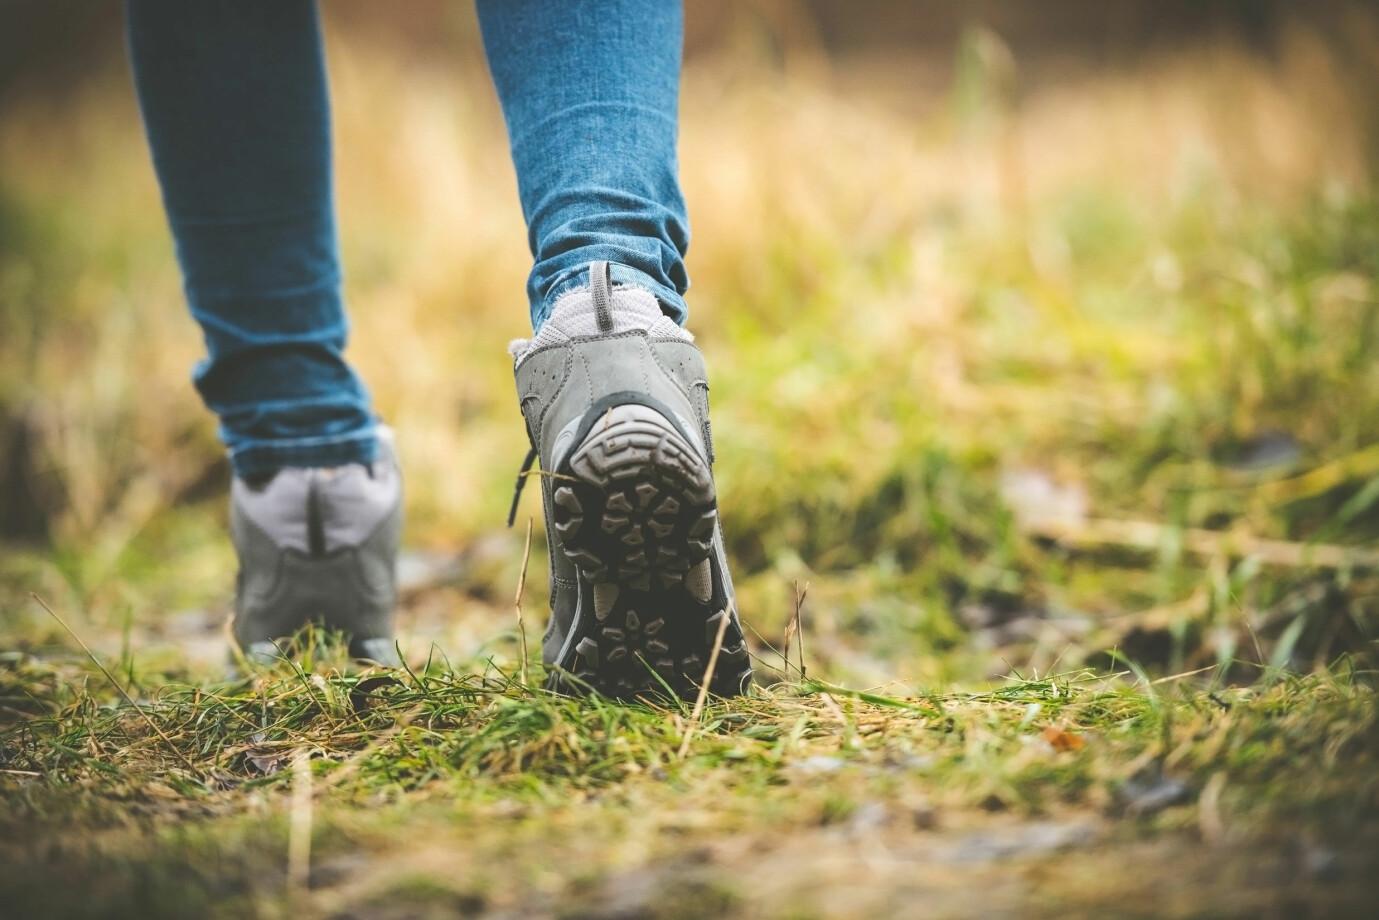 Forskning viser at andelen av ungdom som deltar i friluftsliv varierer systematisk med sosioøkonomiske forskjeller.